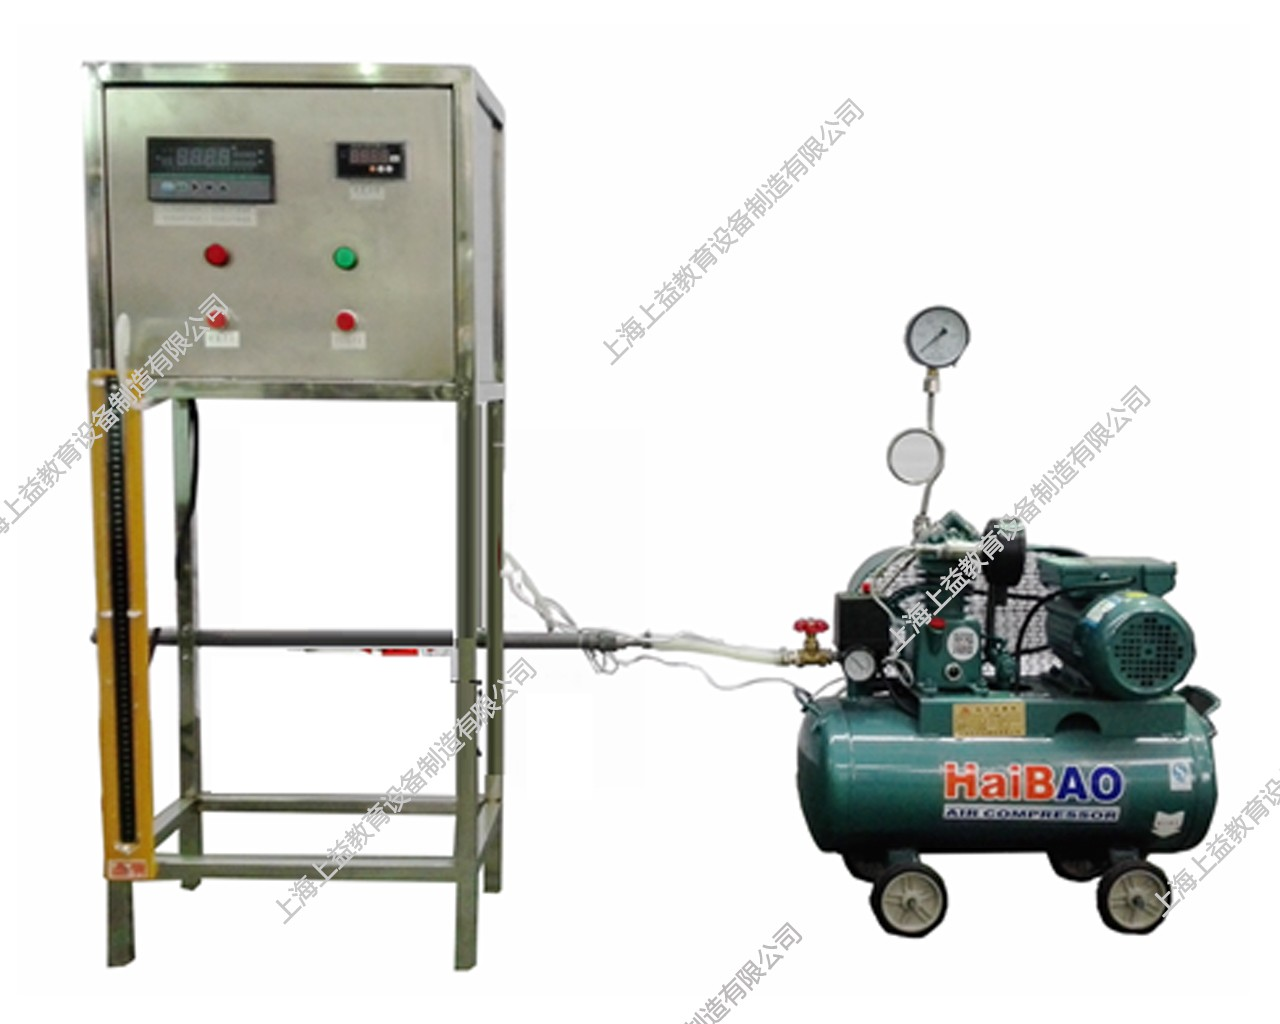 SYCN-21活塞式压气机性能实验装置